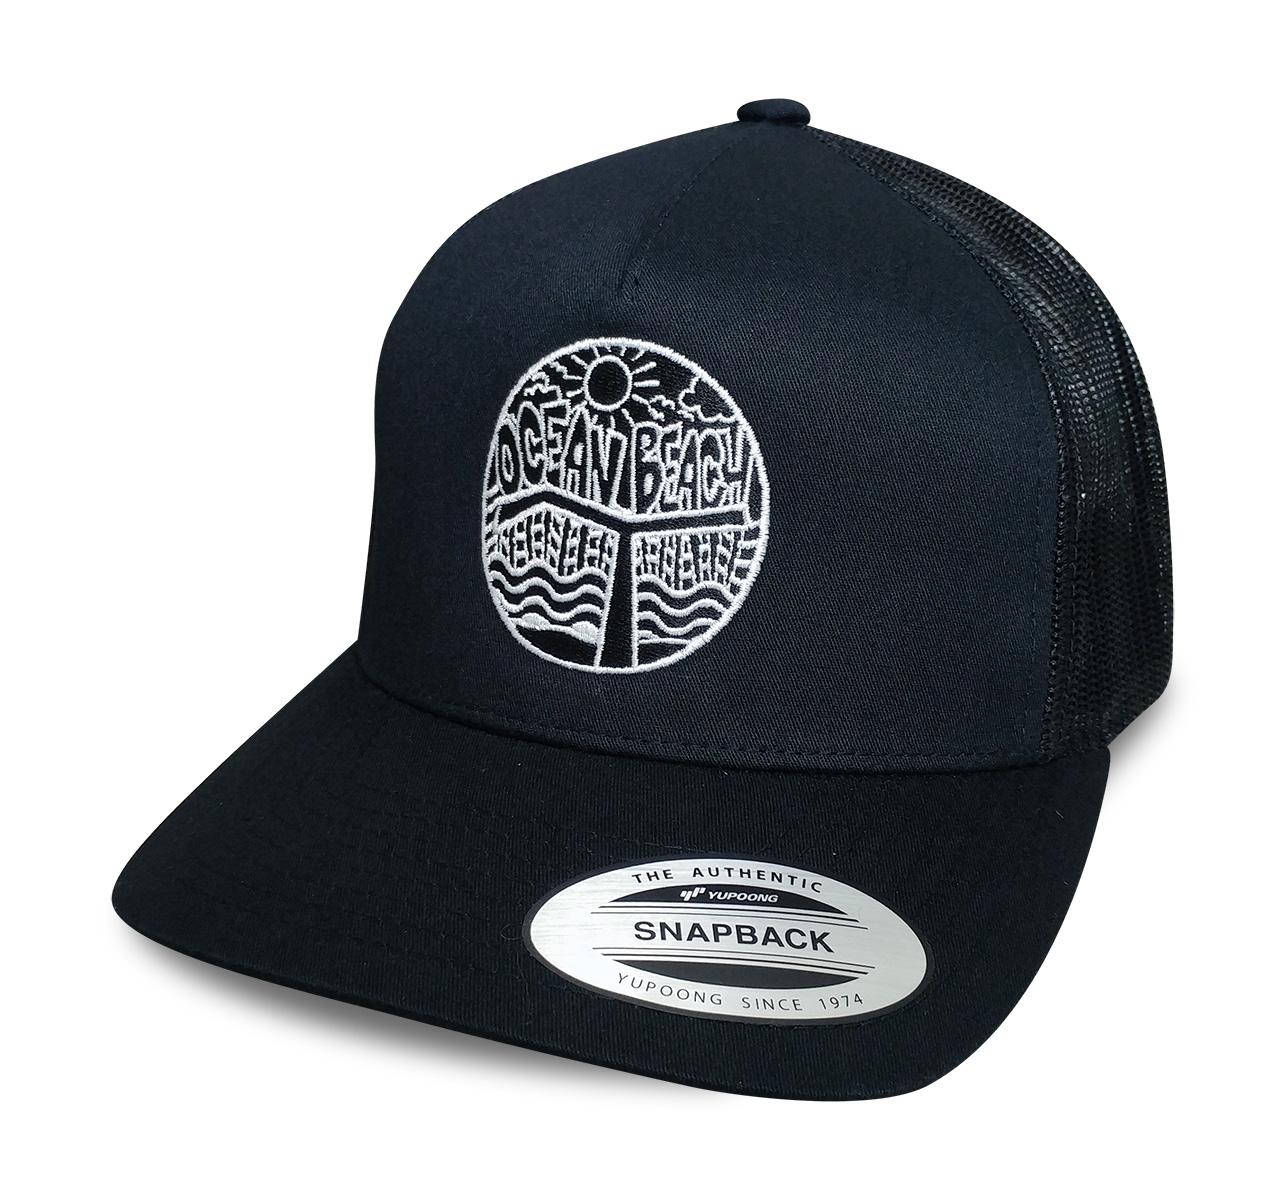 Ocean Beach Product: OB Pier Snapback Hat (white logo)